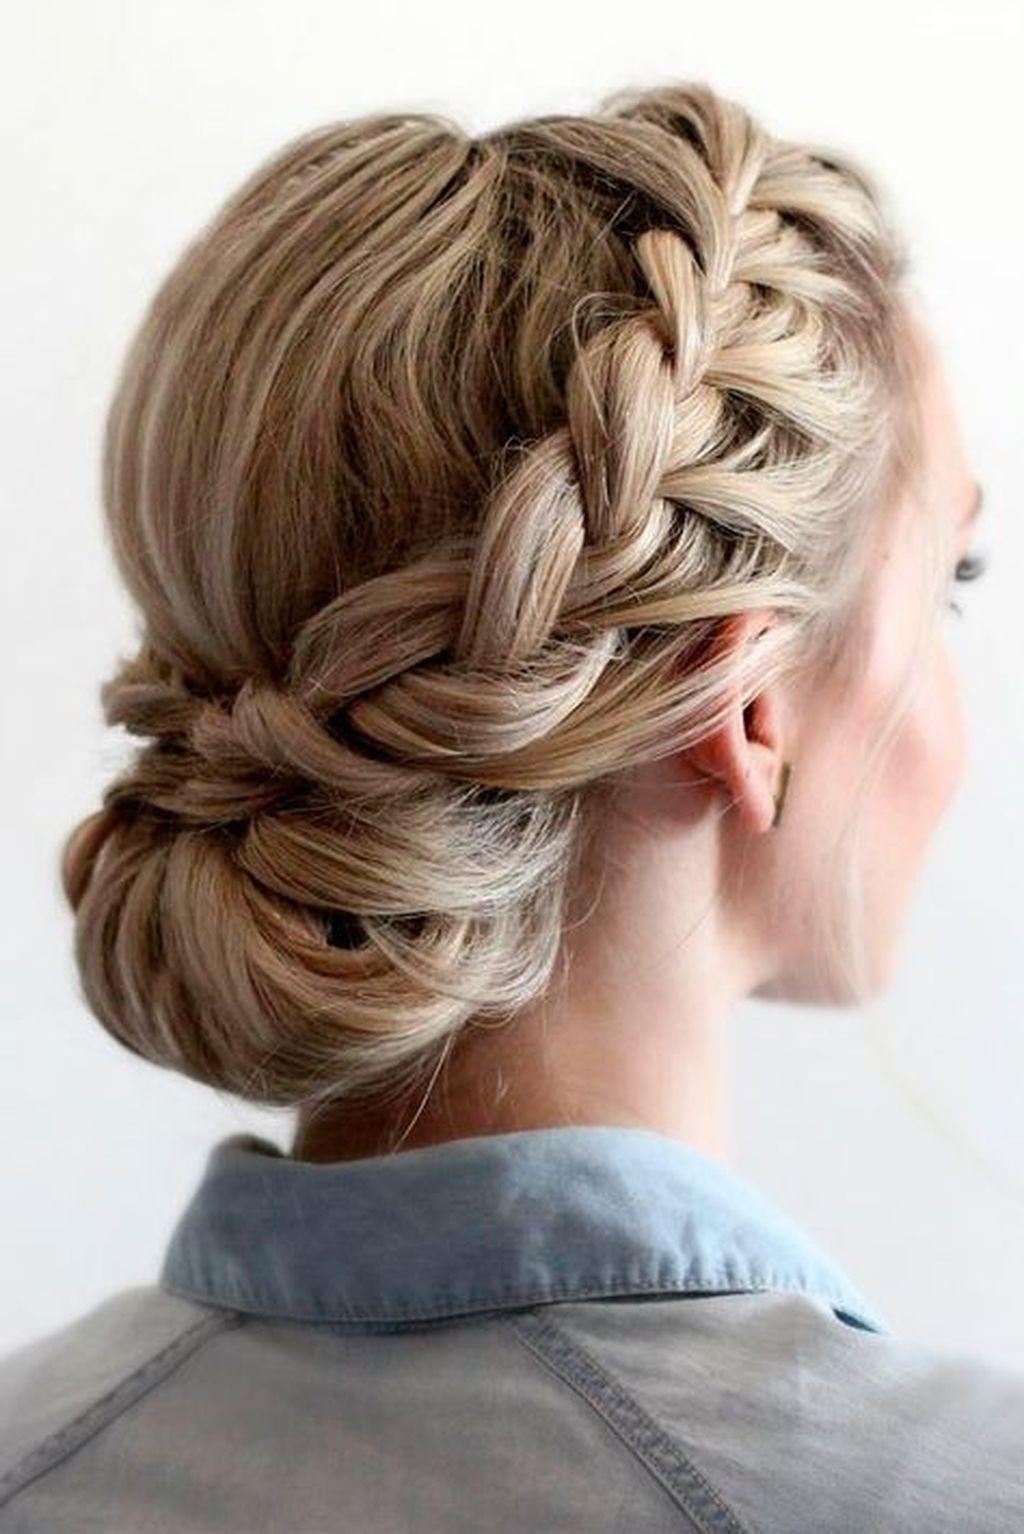 50 Easy Braid Hairstyles Ideas For Holiday Season ...